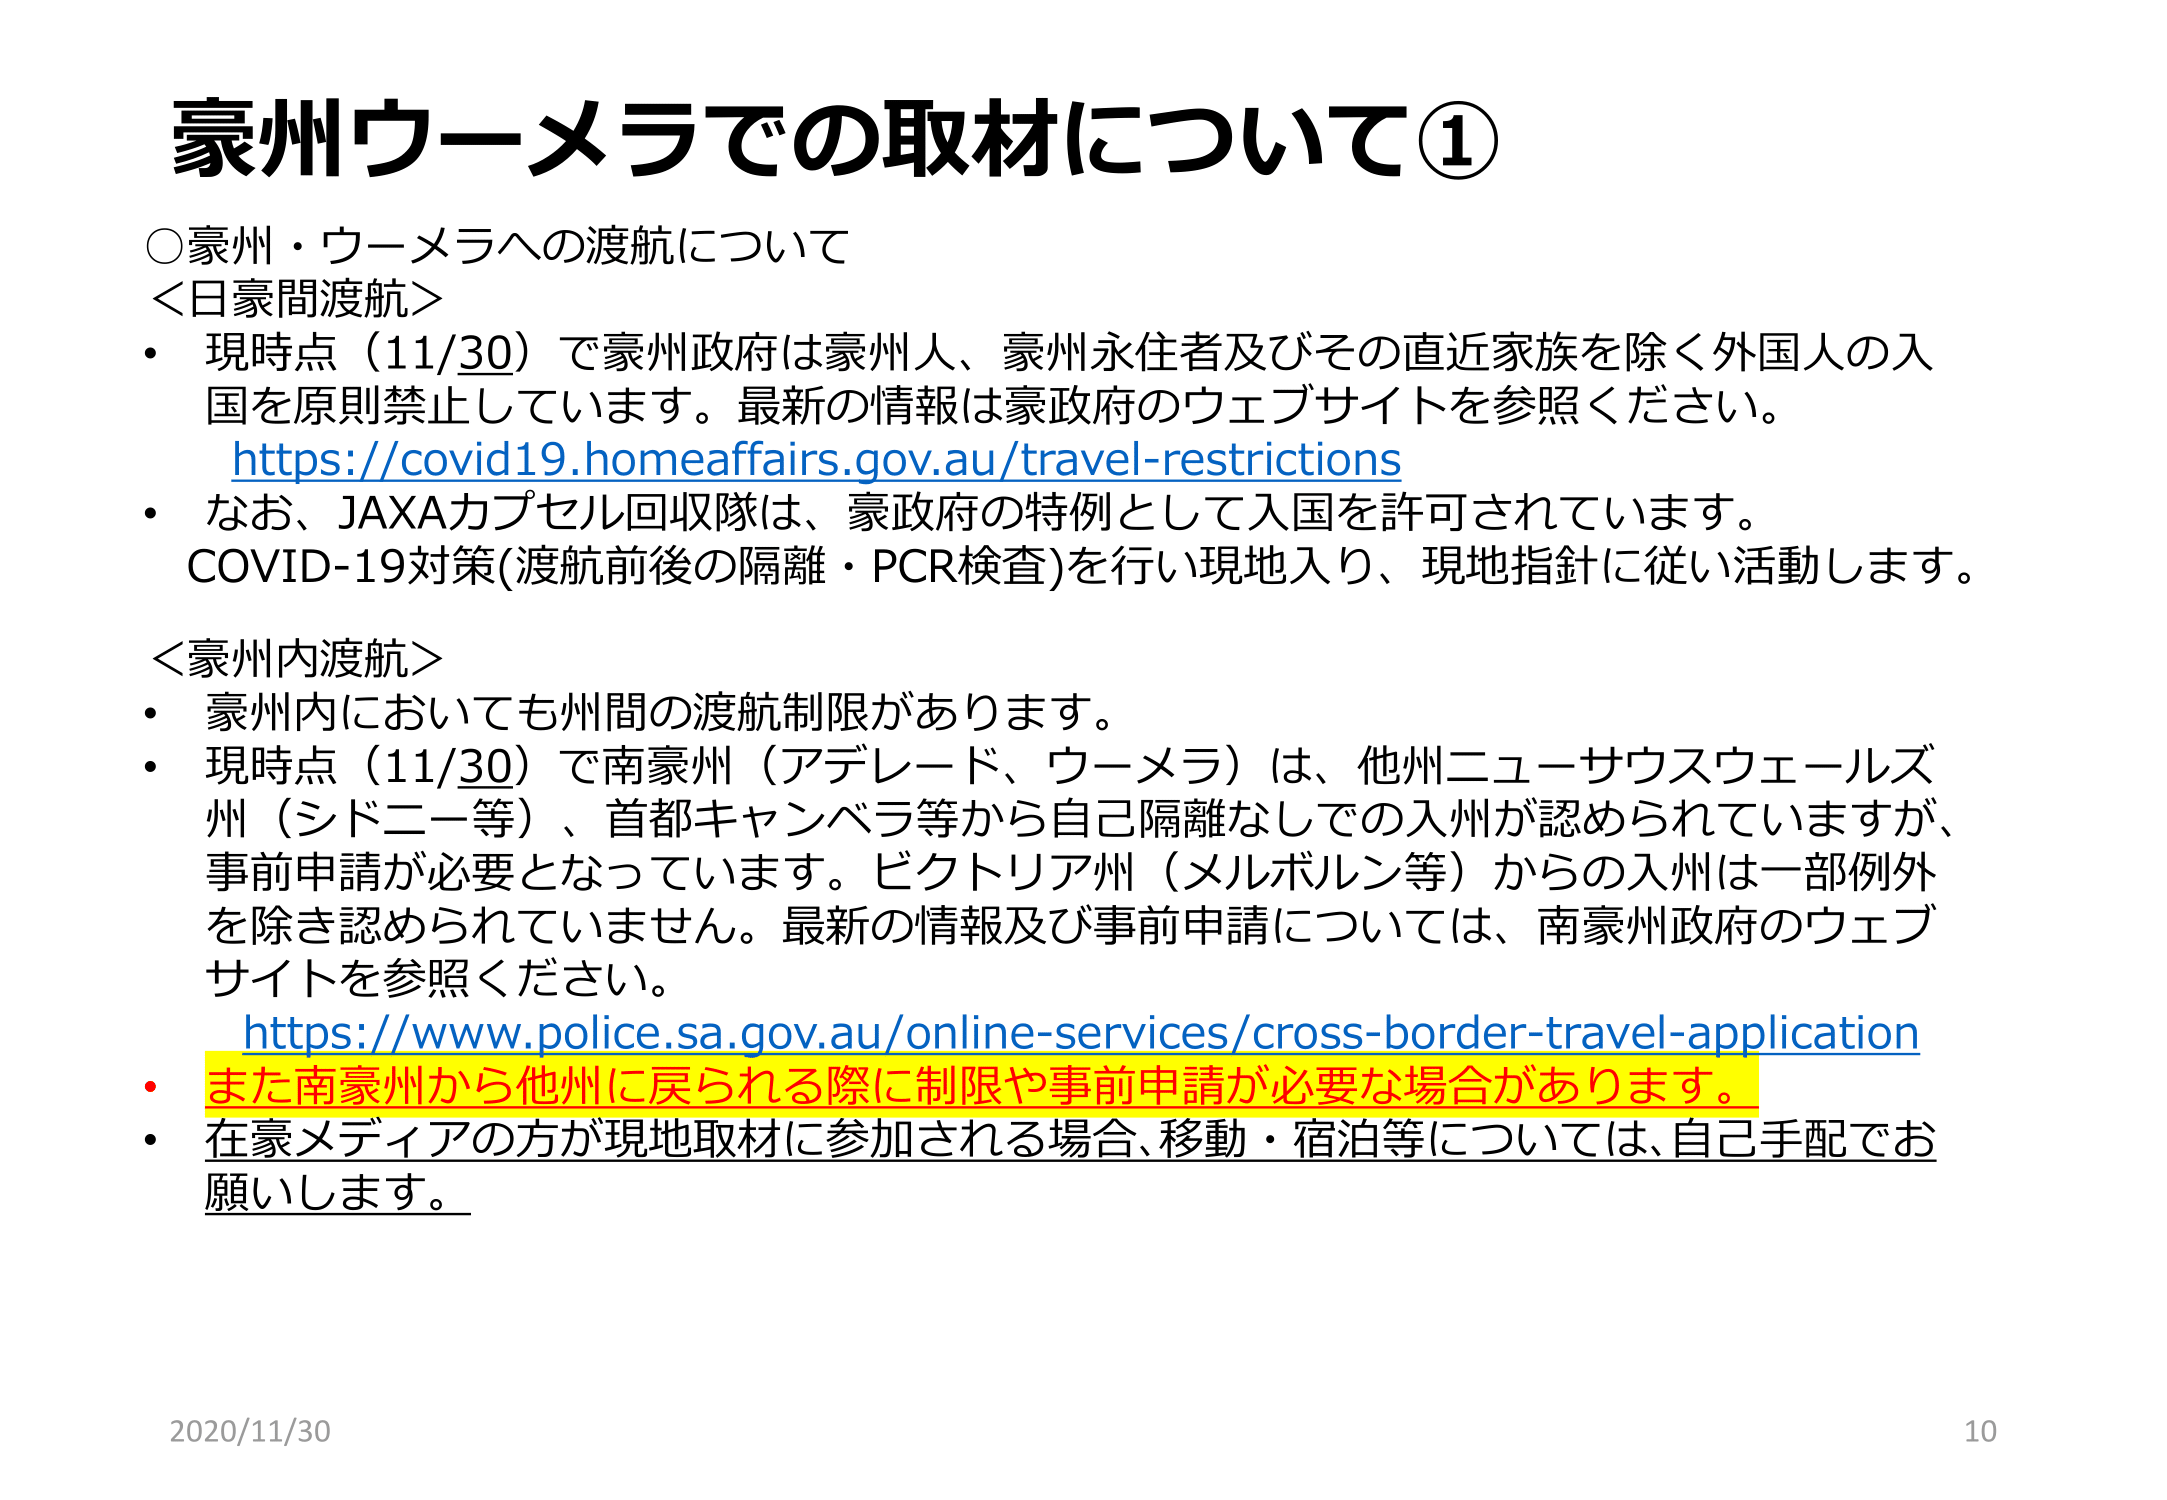 f:id:Imamura:20201130154417p:plain:h250